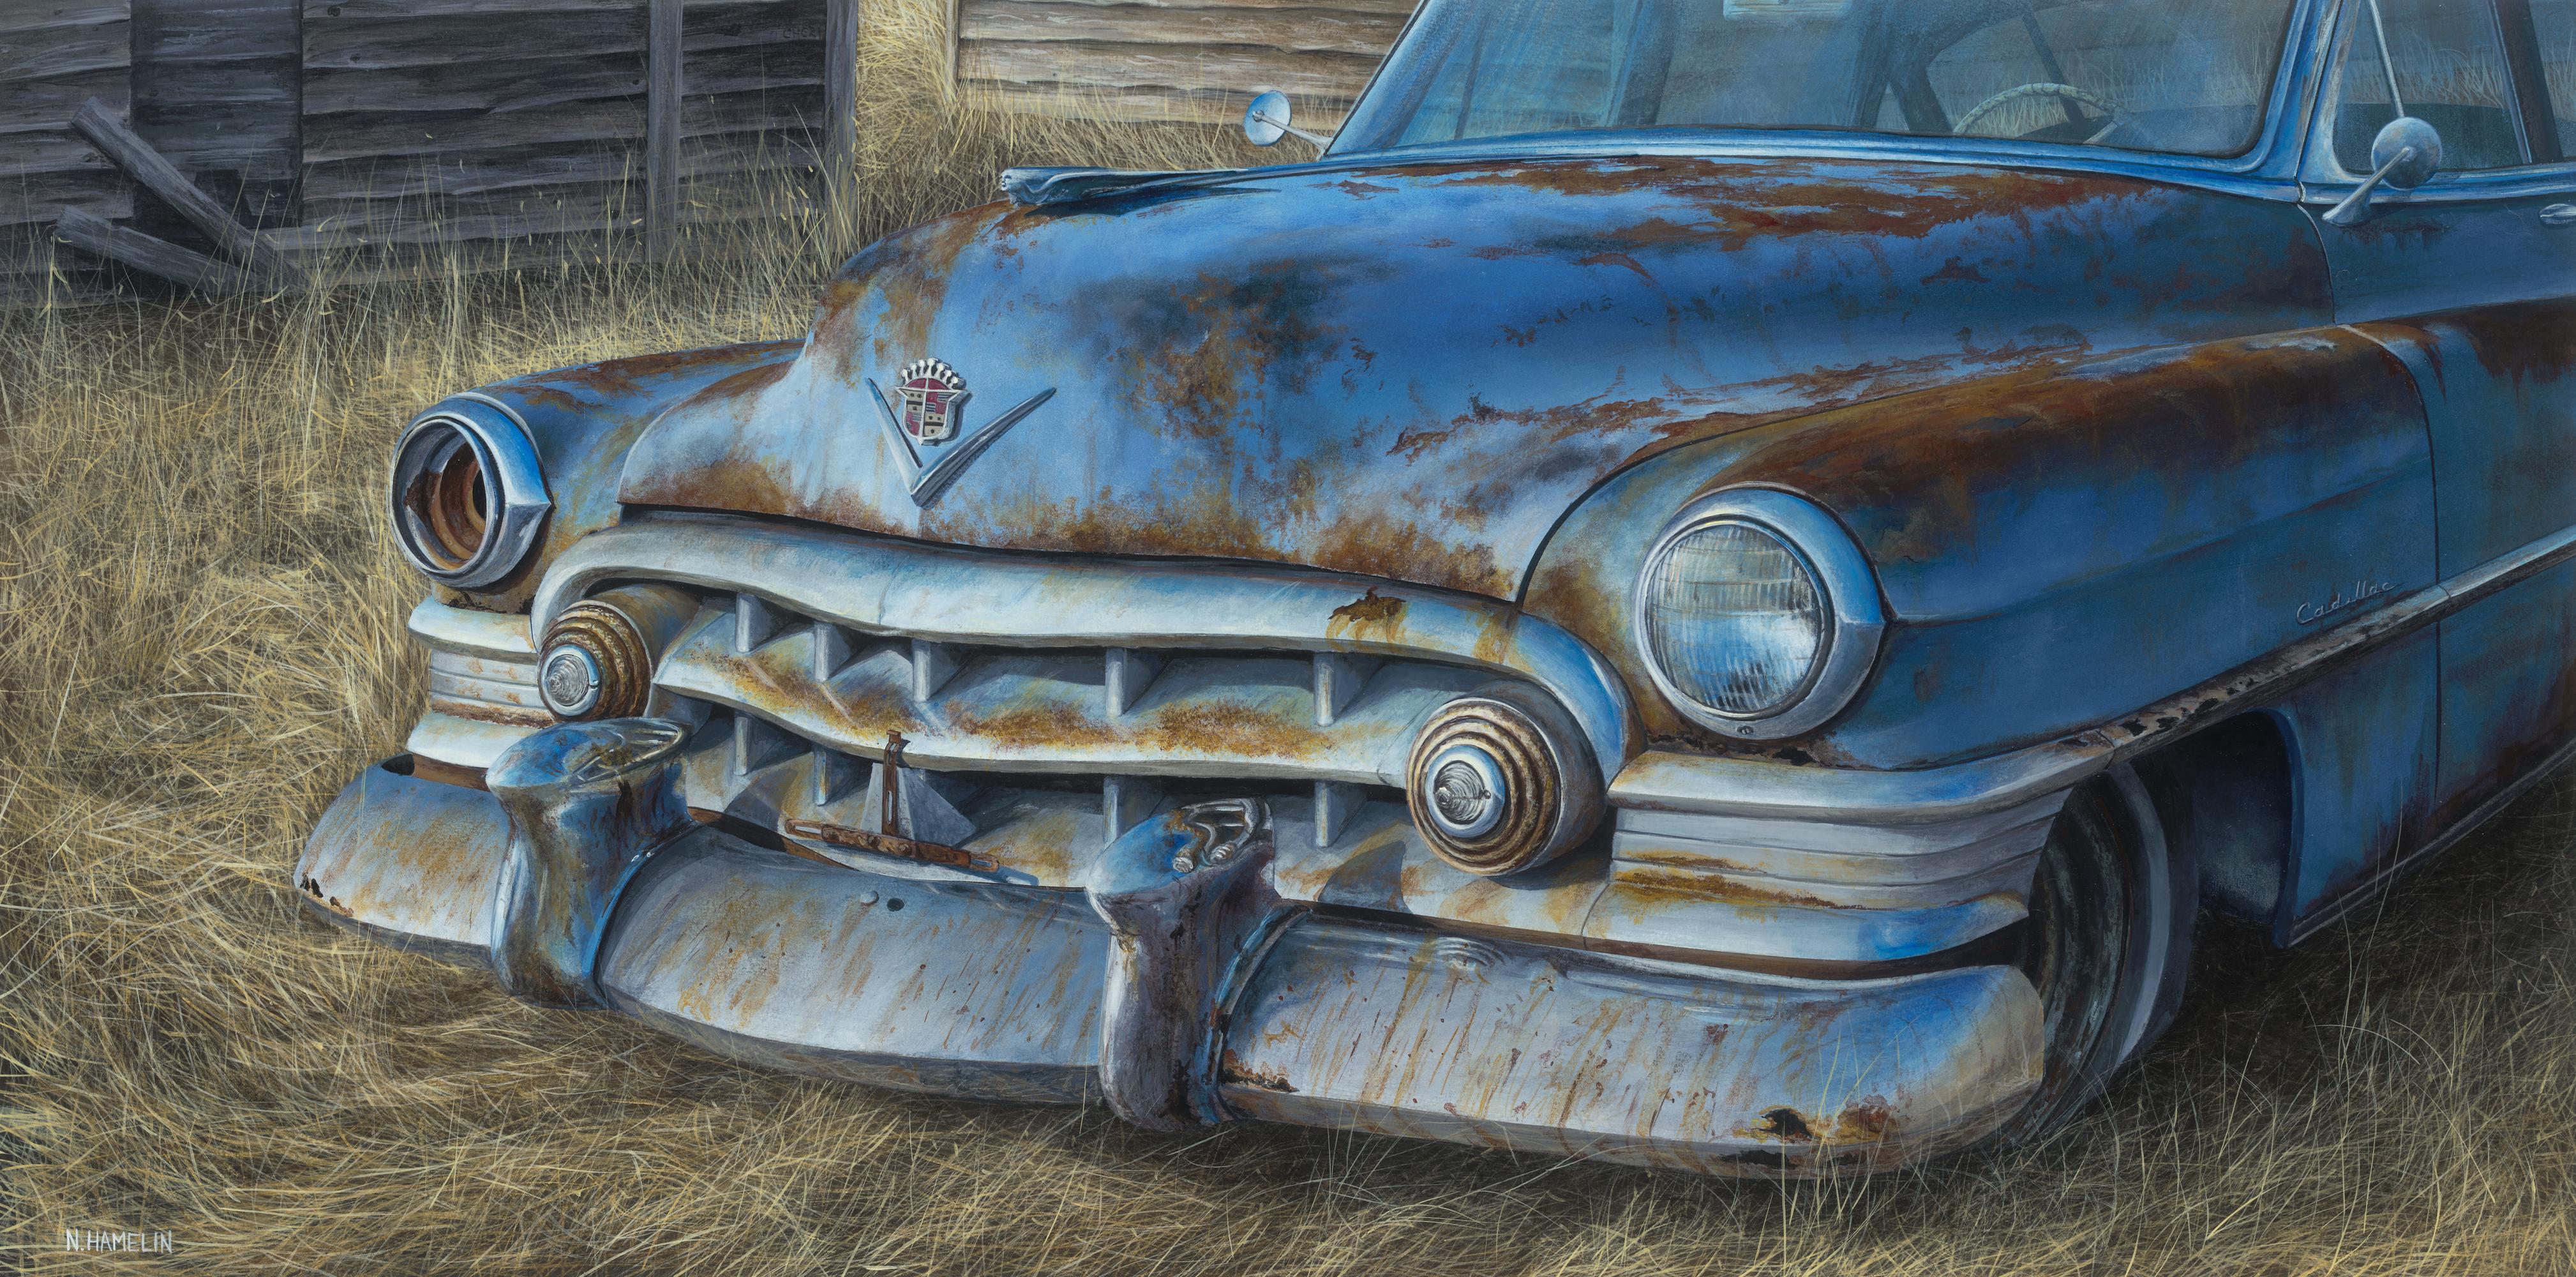 e1c46f40 5ad2 48dd bd2b e0f8ced7e5a9 Cadillac Blues